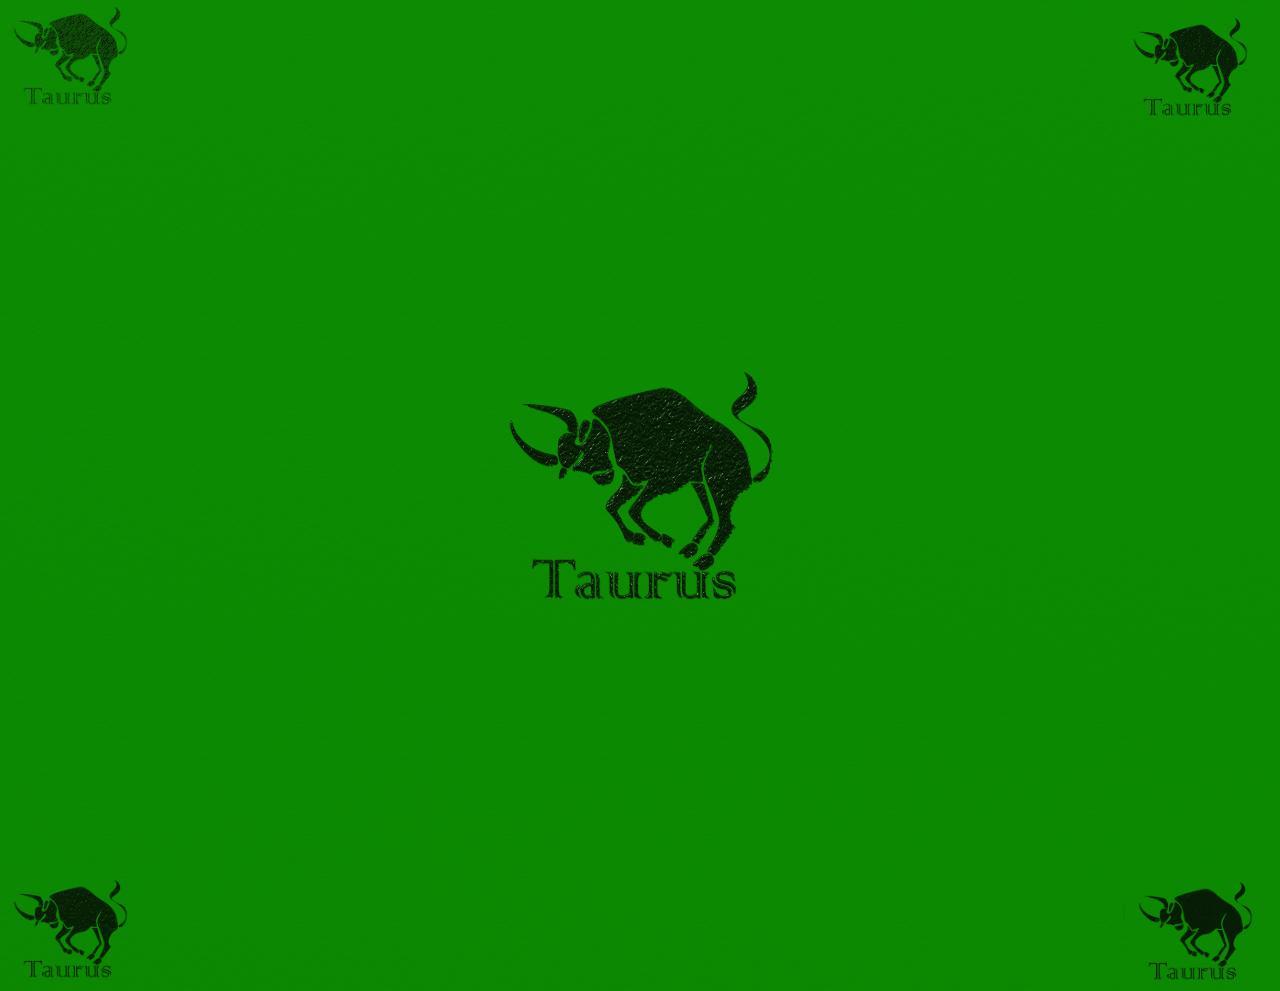 black taurus wallpaper black taurus desktop background pictures 1280x991